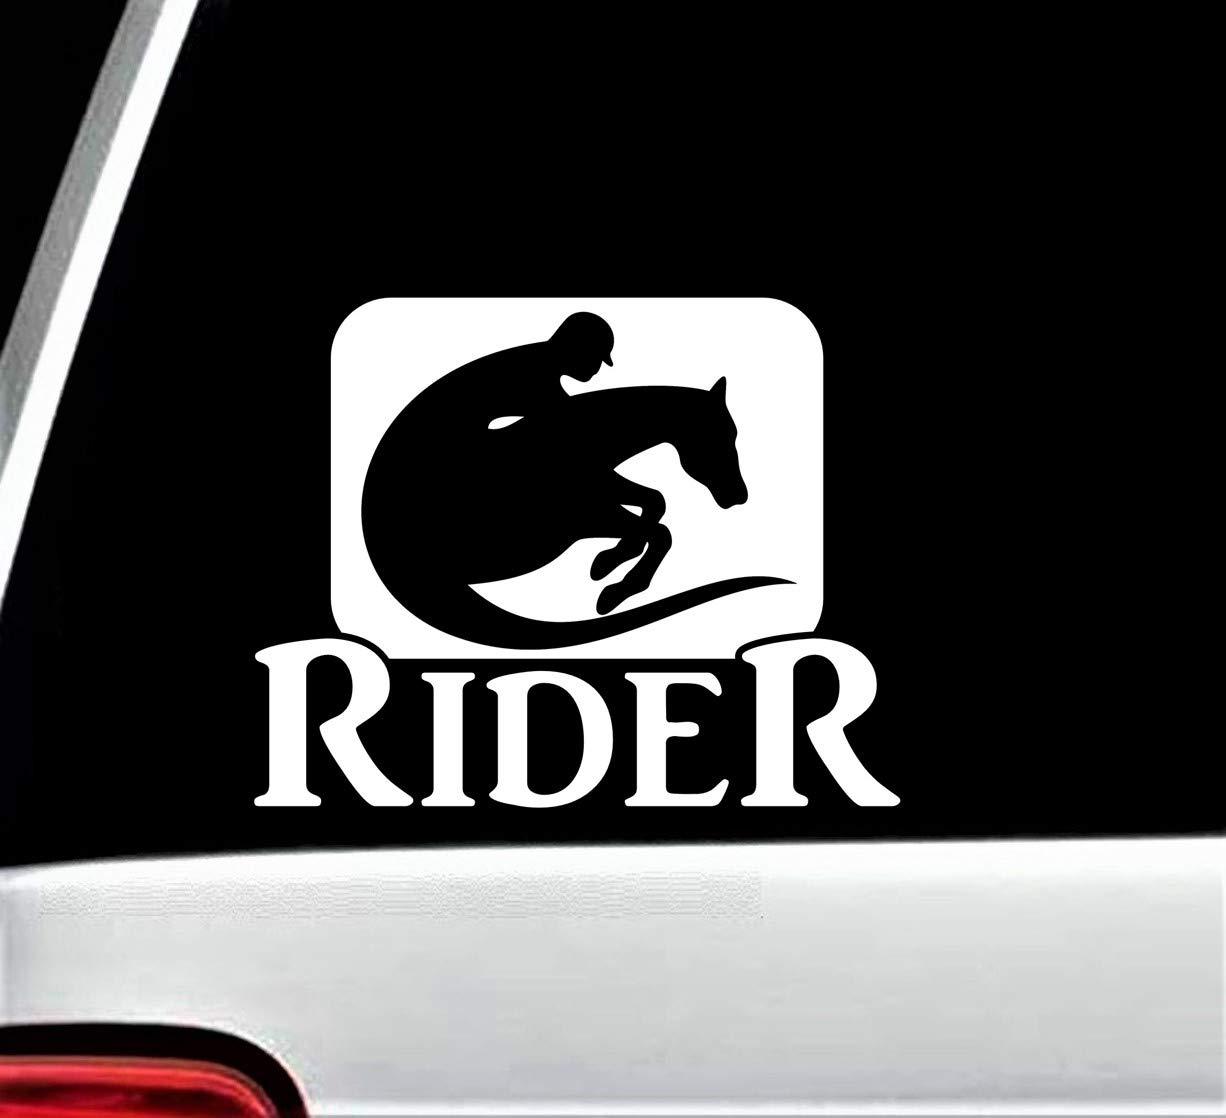 Horseback Riding Horse Rider Decal Sticker for Car Window 6.50 Inch BG 316